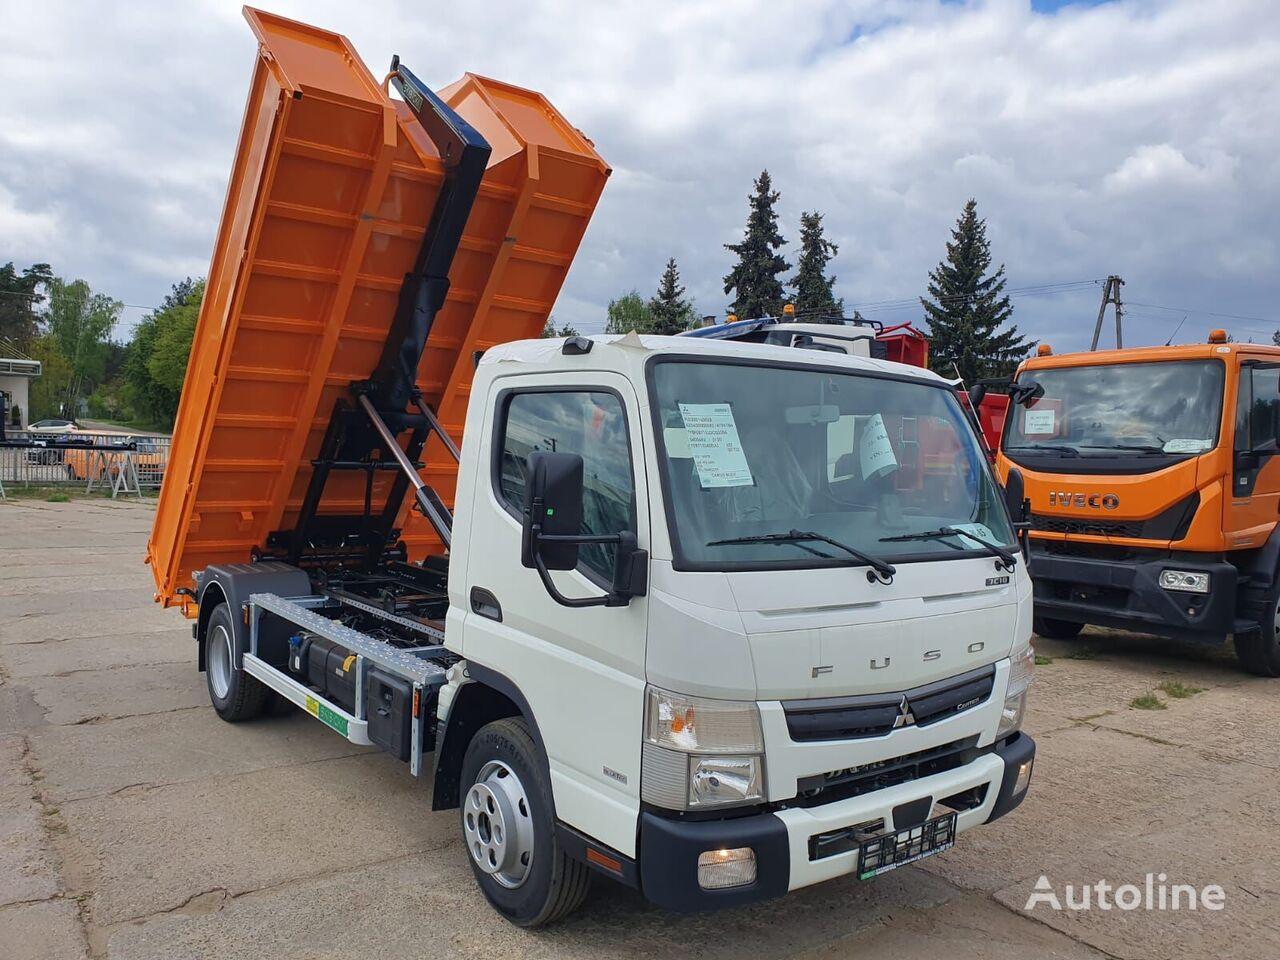 novi Mitsubishi Fuso 7c18 kamion rol kiper